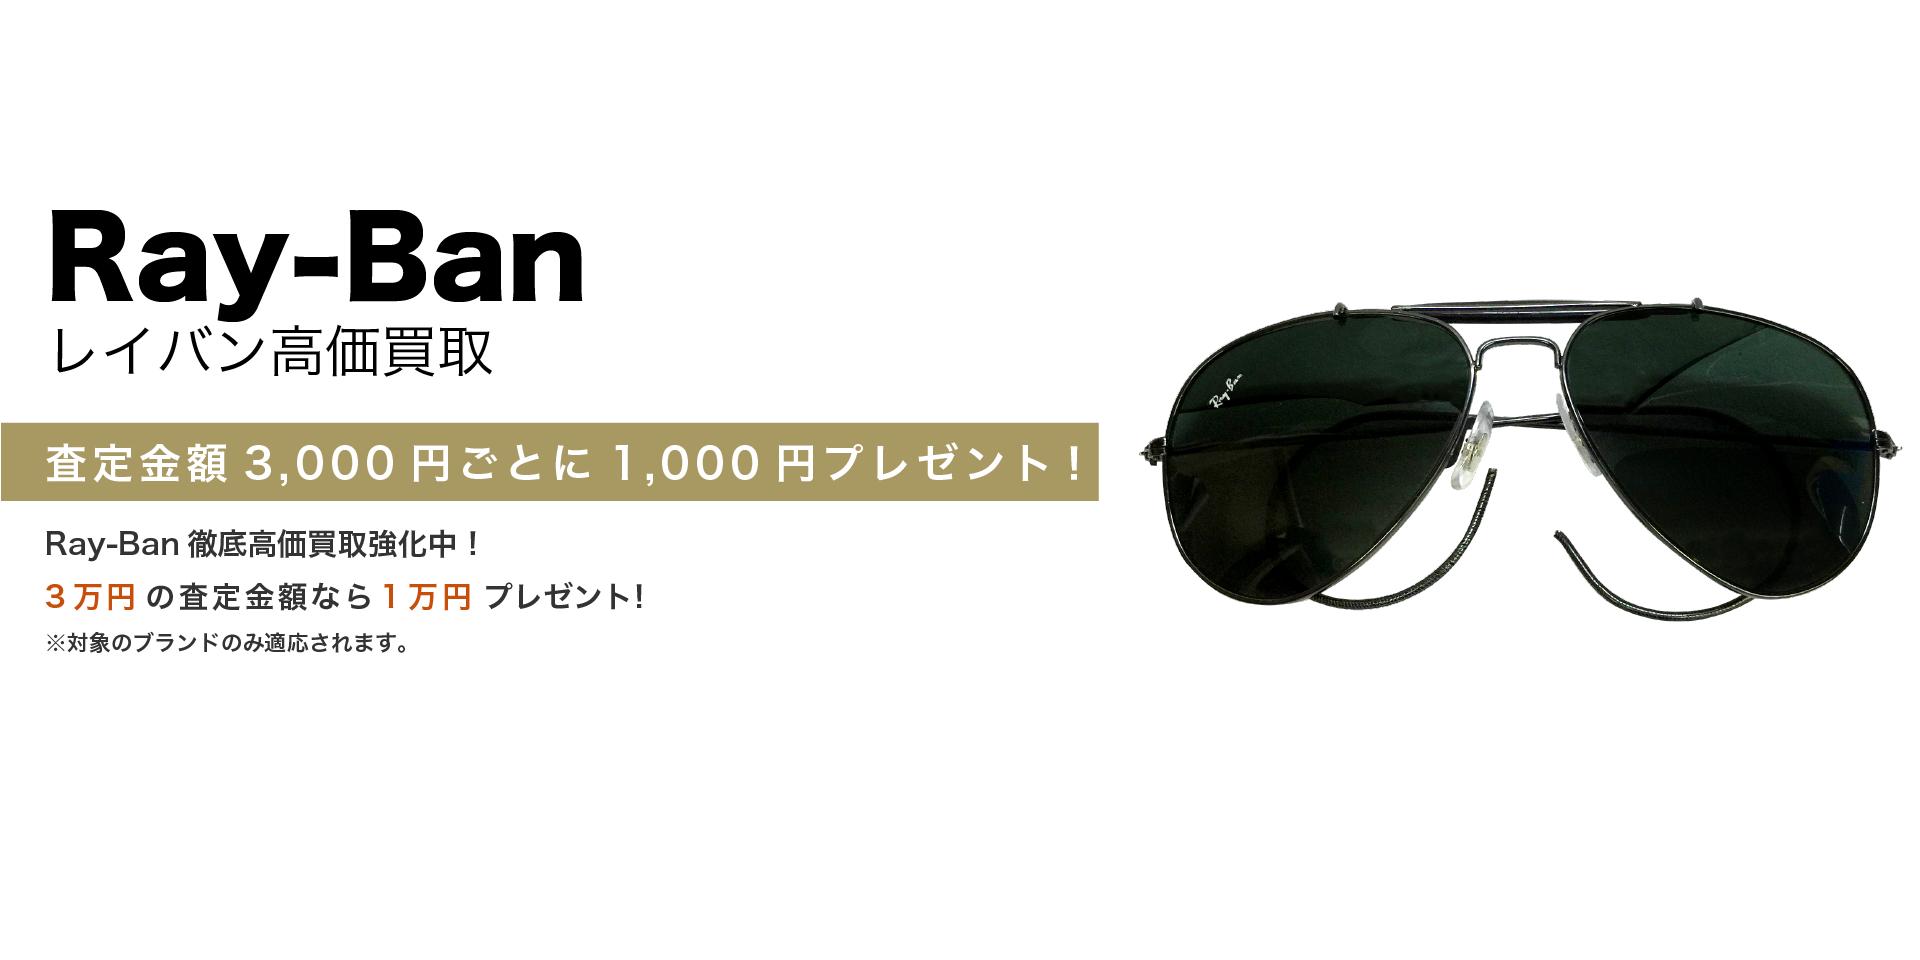 Ray-Banのキービジュアル